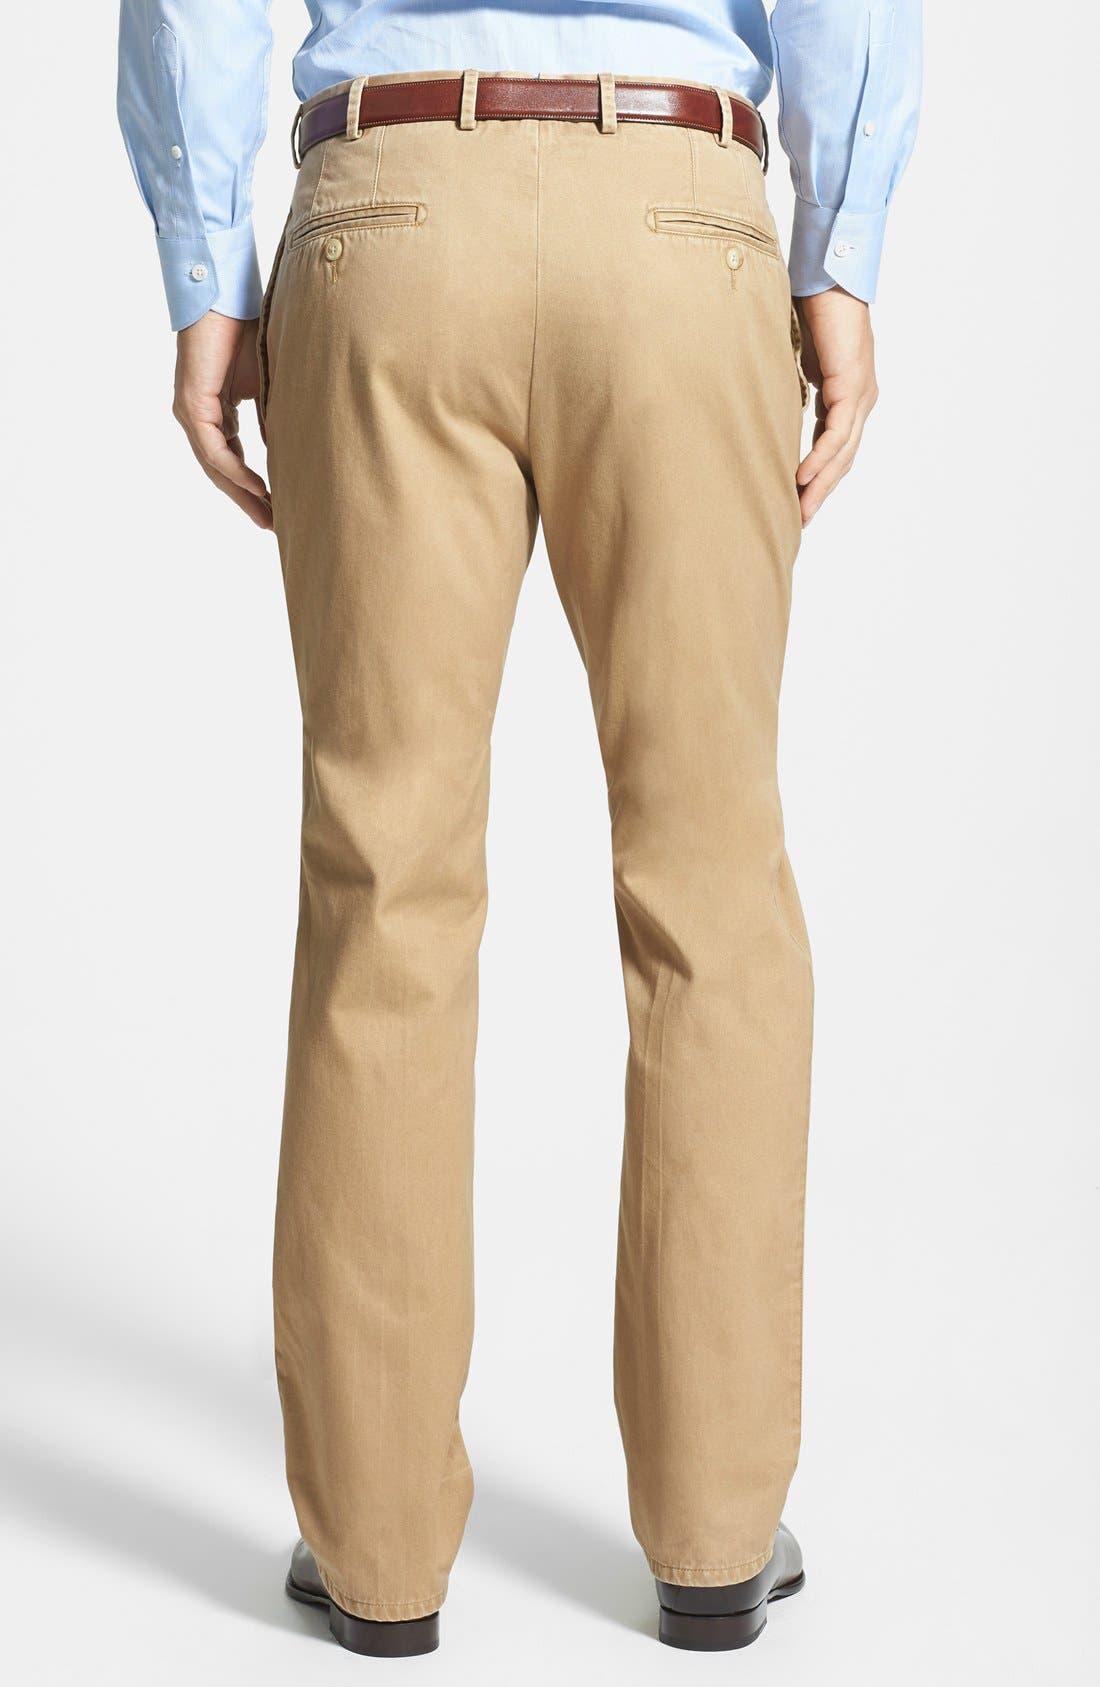 Garment Washed Twill Pants,                             Alternate thumbnail 2, color,                             British Tan